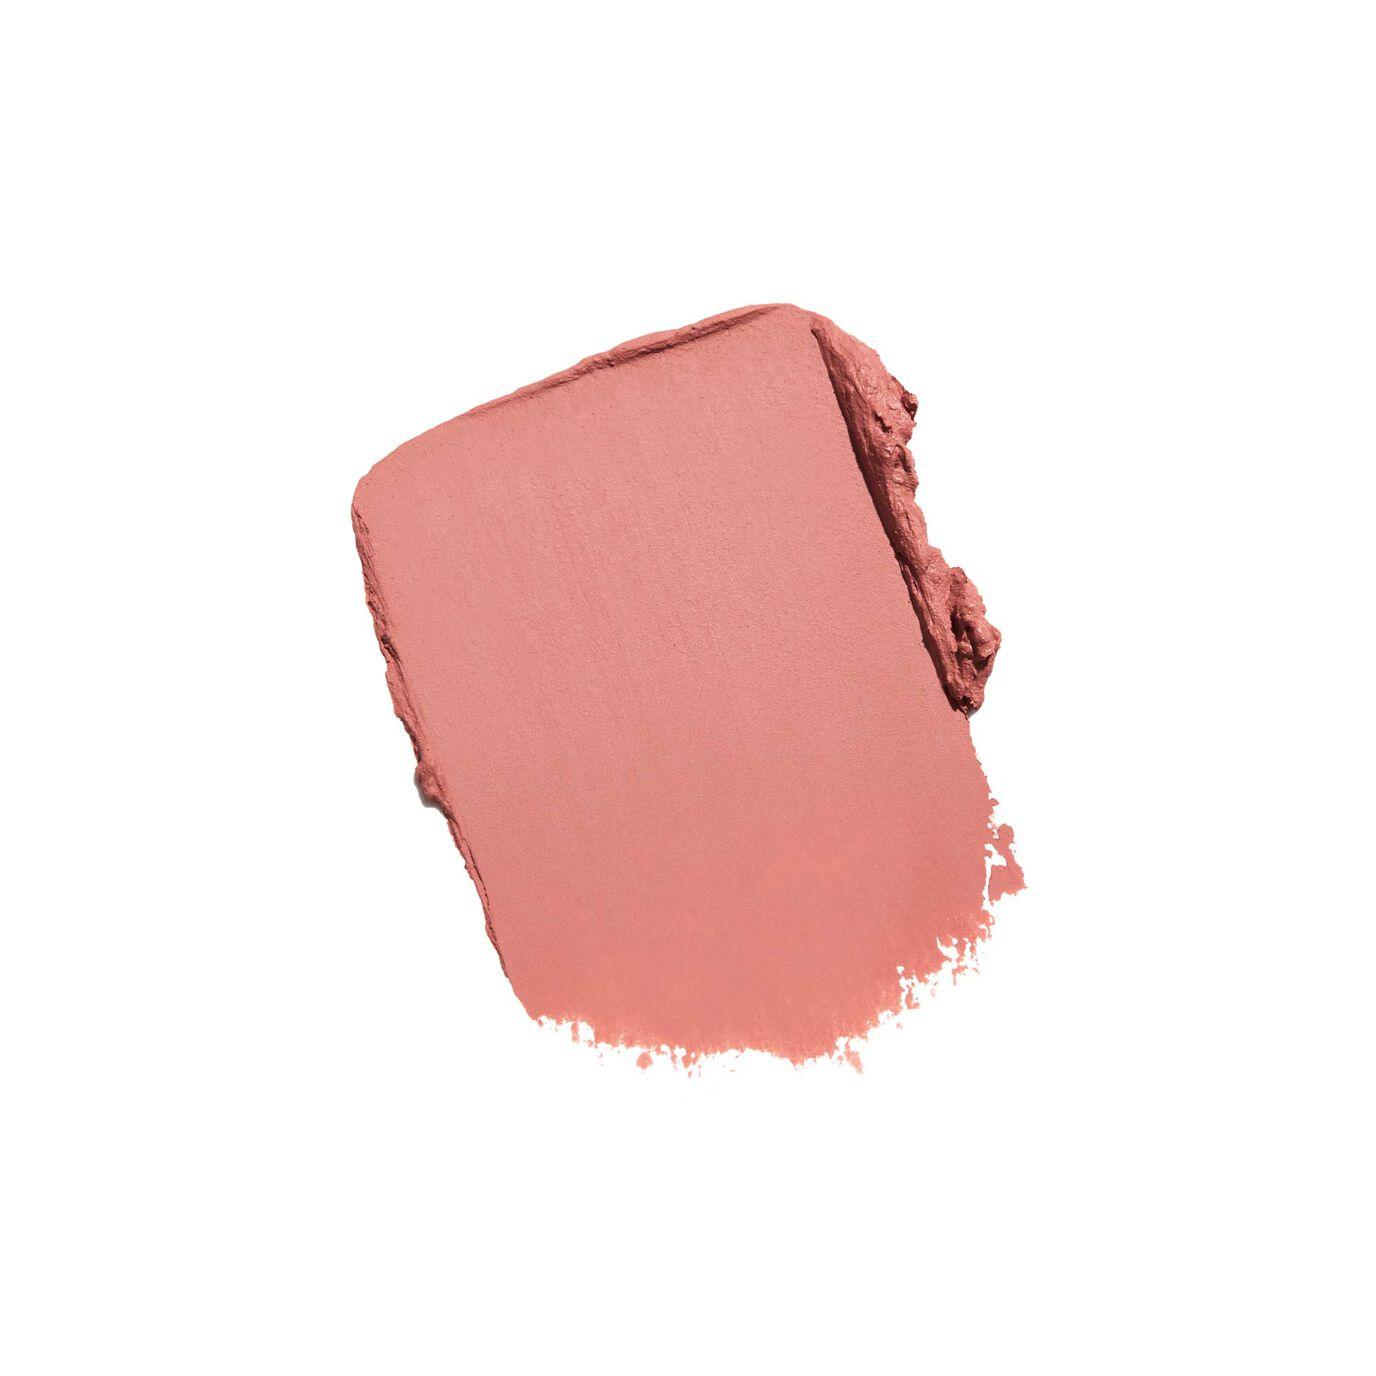 Stick Blush - Peachy Keen